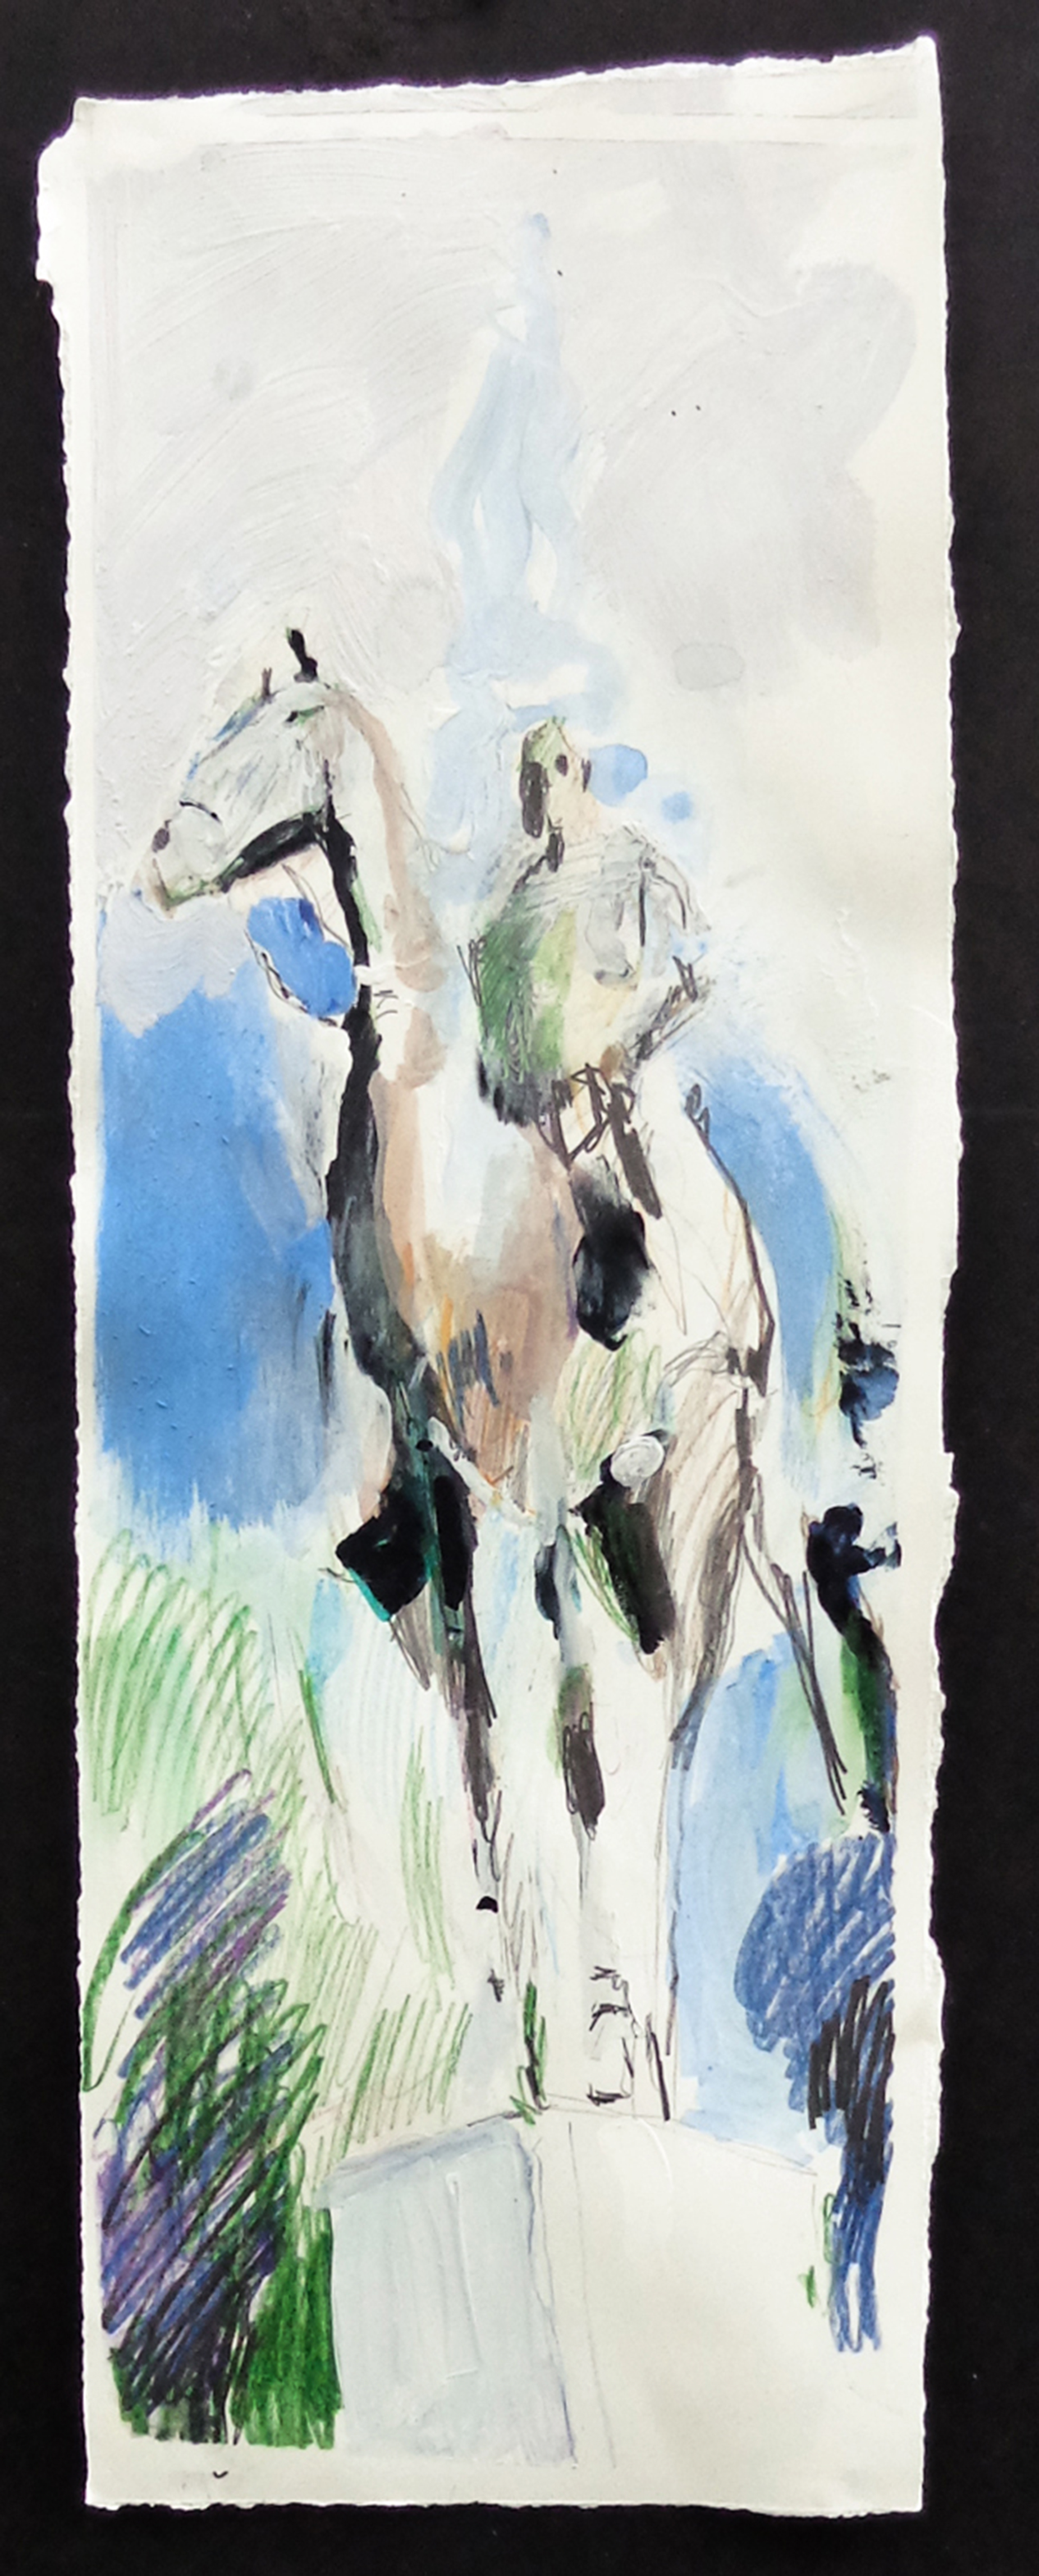 "Forrest on horseback 2 22' x 8"" pencil, ink, gesso, gouache on torn paper 2018"